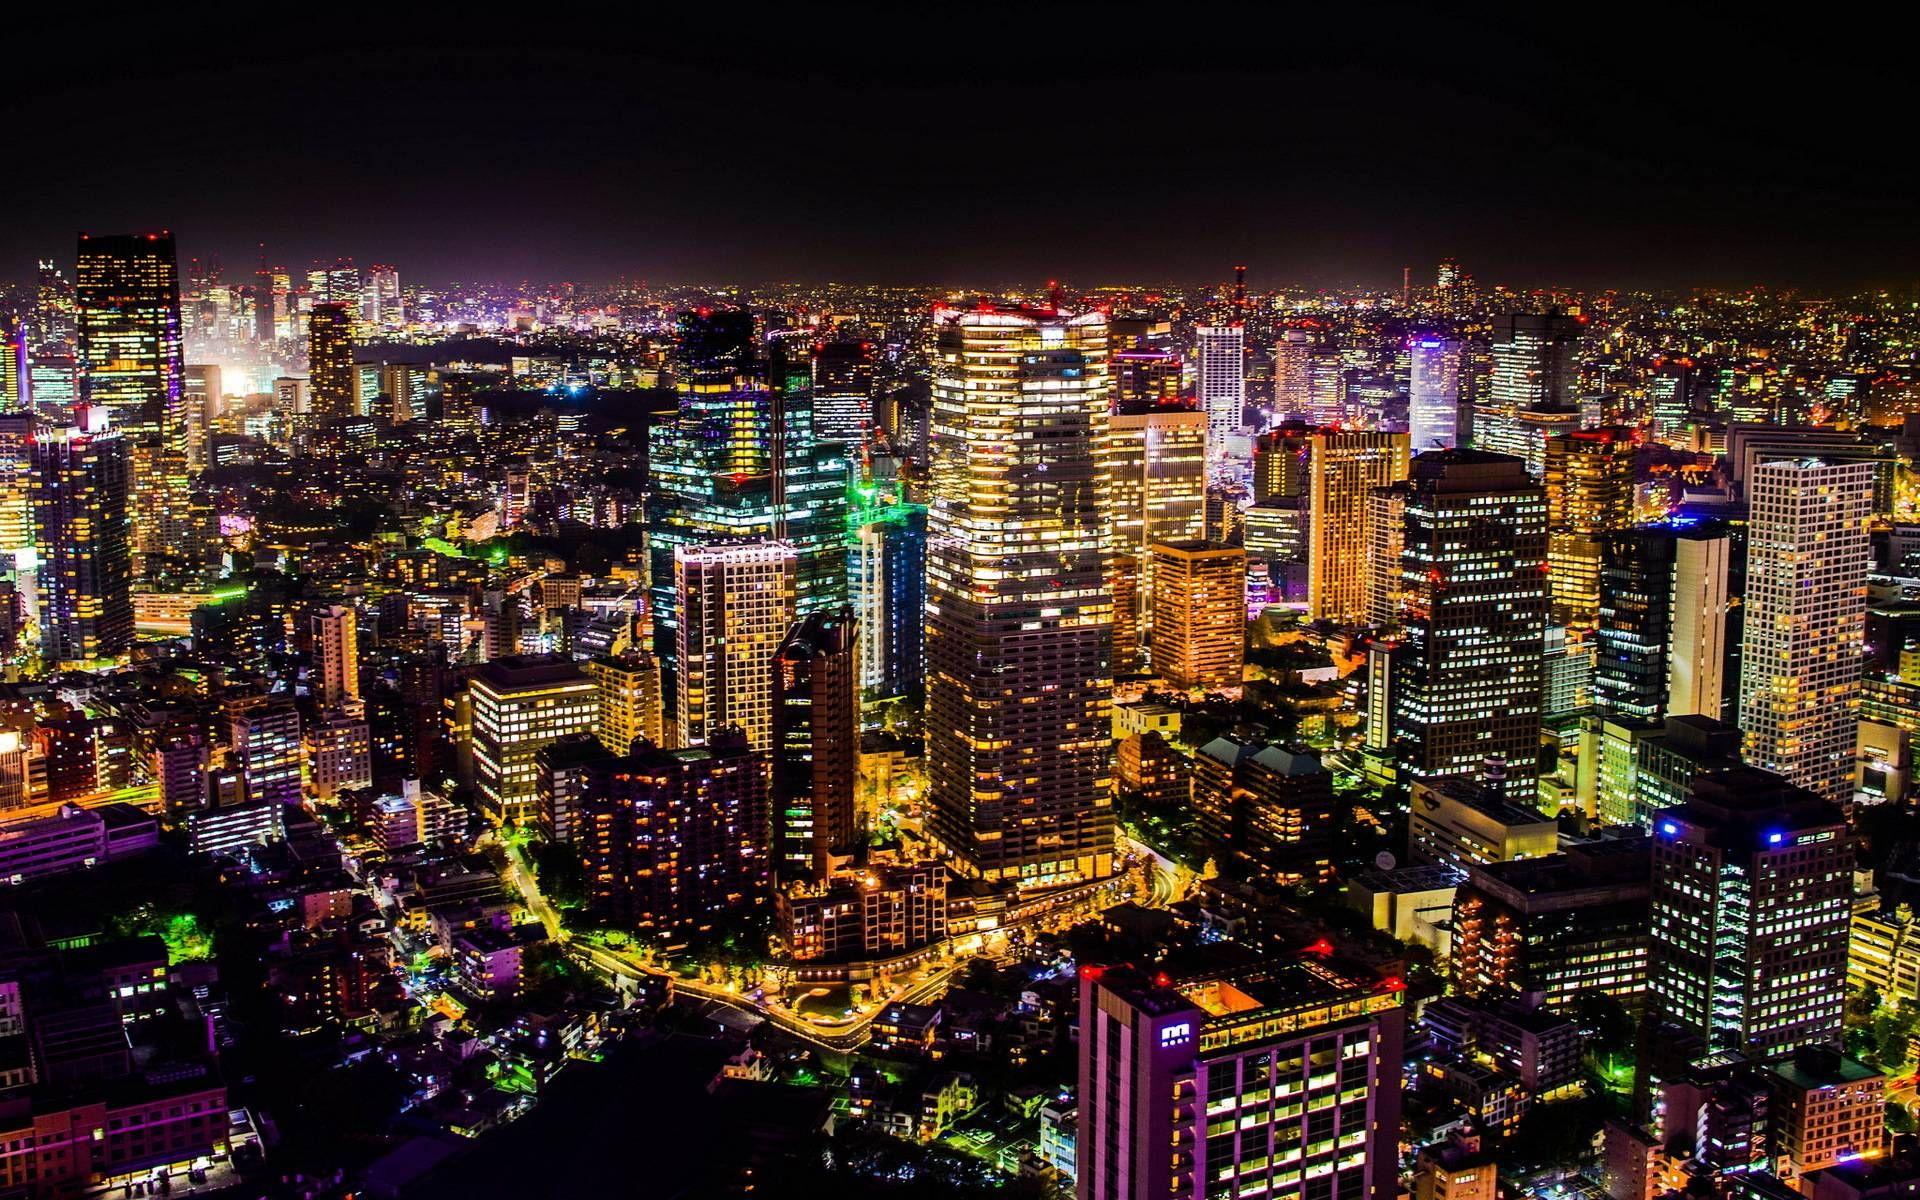 Tokyo City Wallpapers Group (82+) Tokyo travel, Tokyo